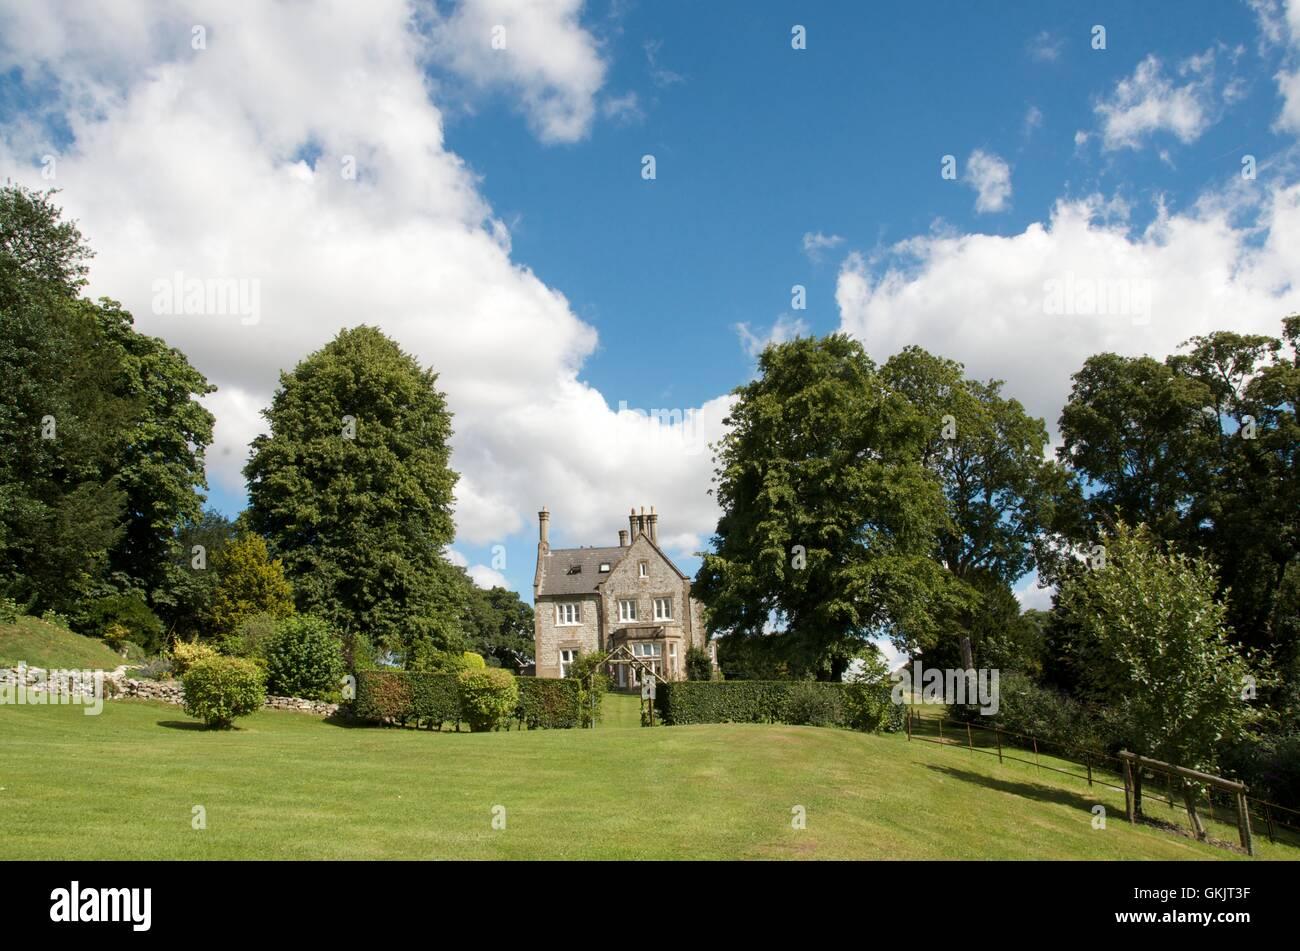 Schönes kleines Herrenhaus in Langrish Surrey England Stockbild